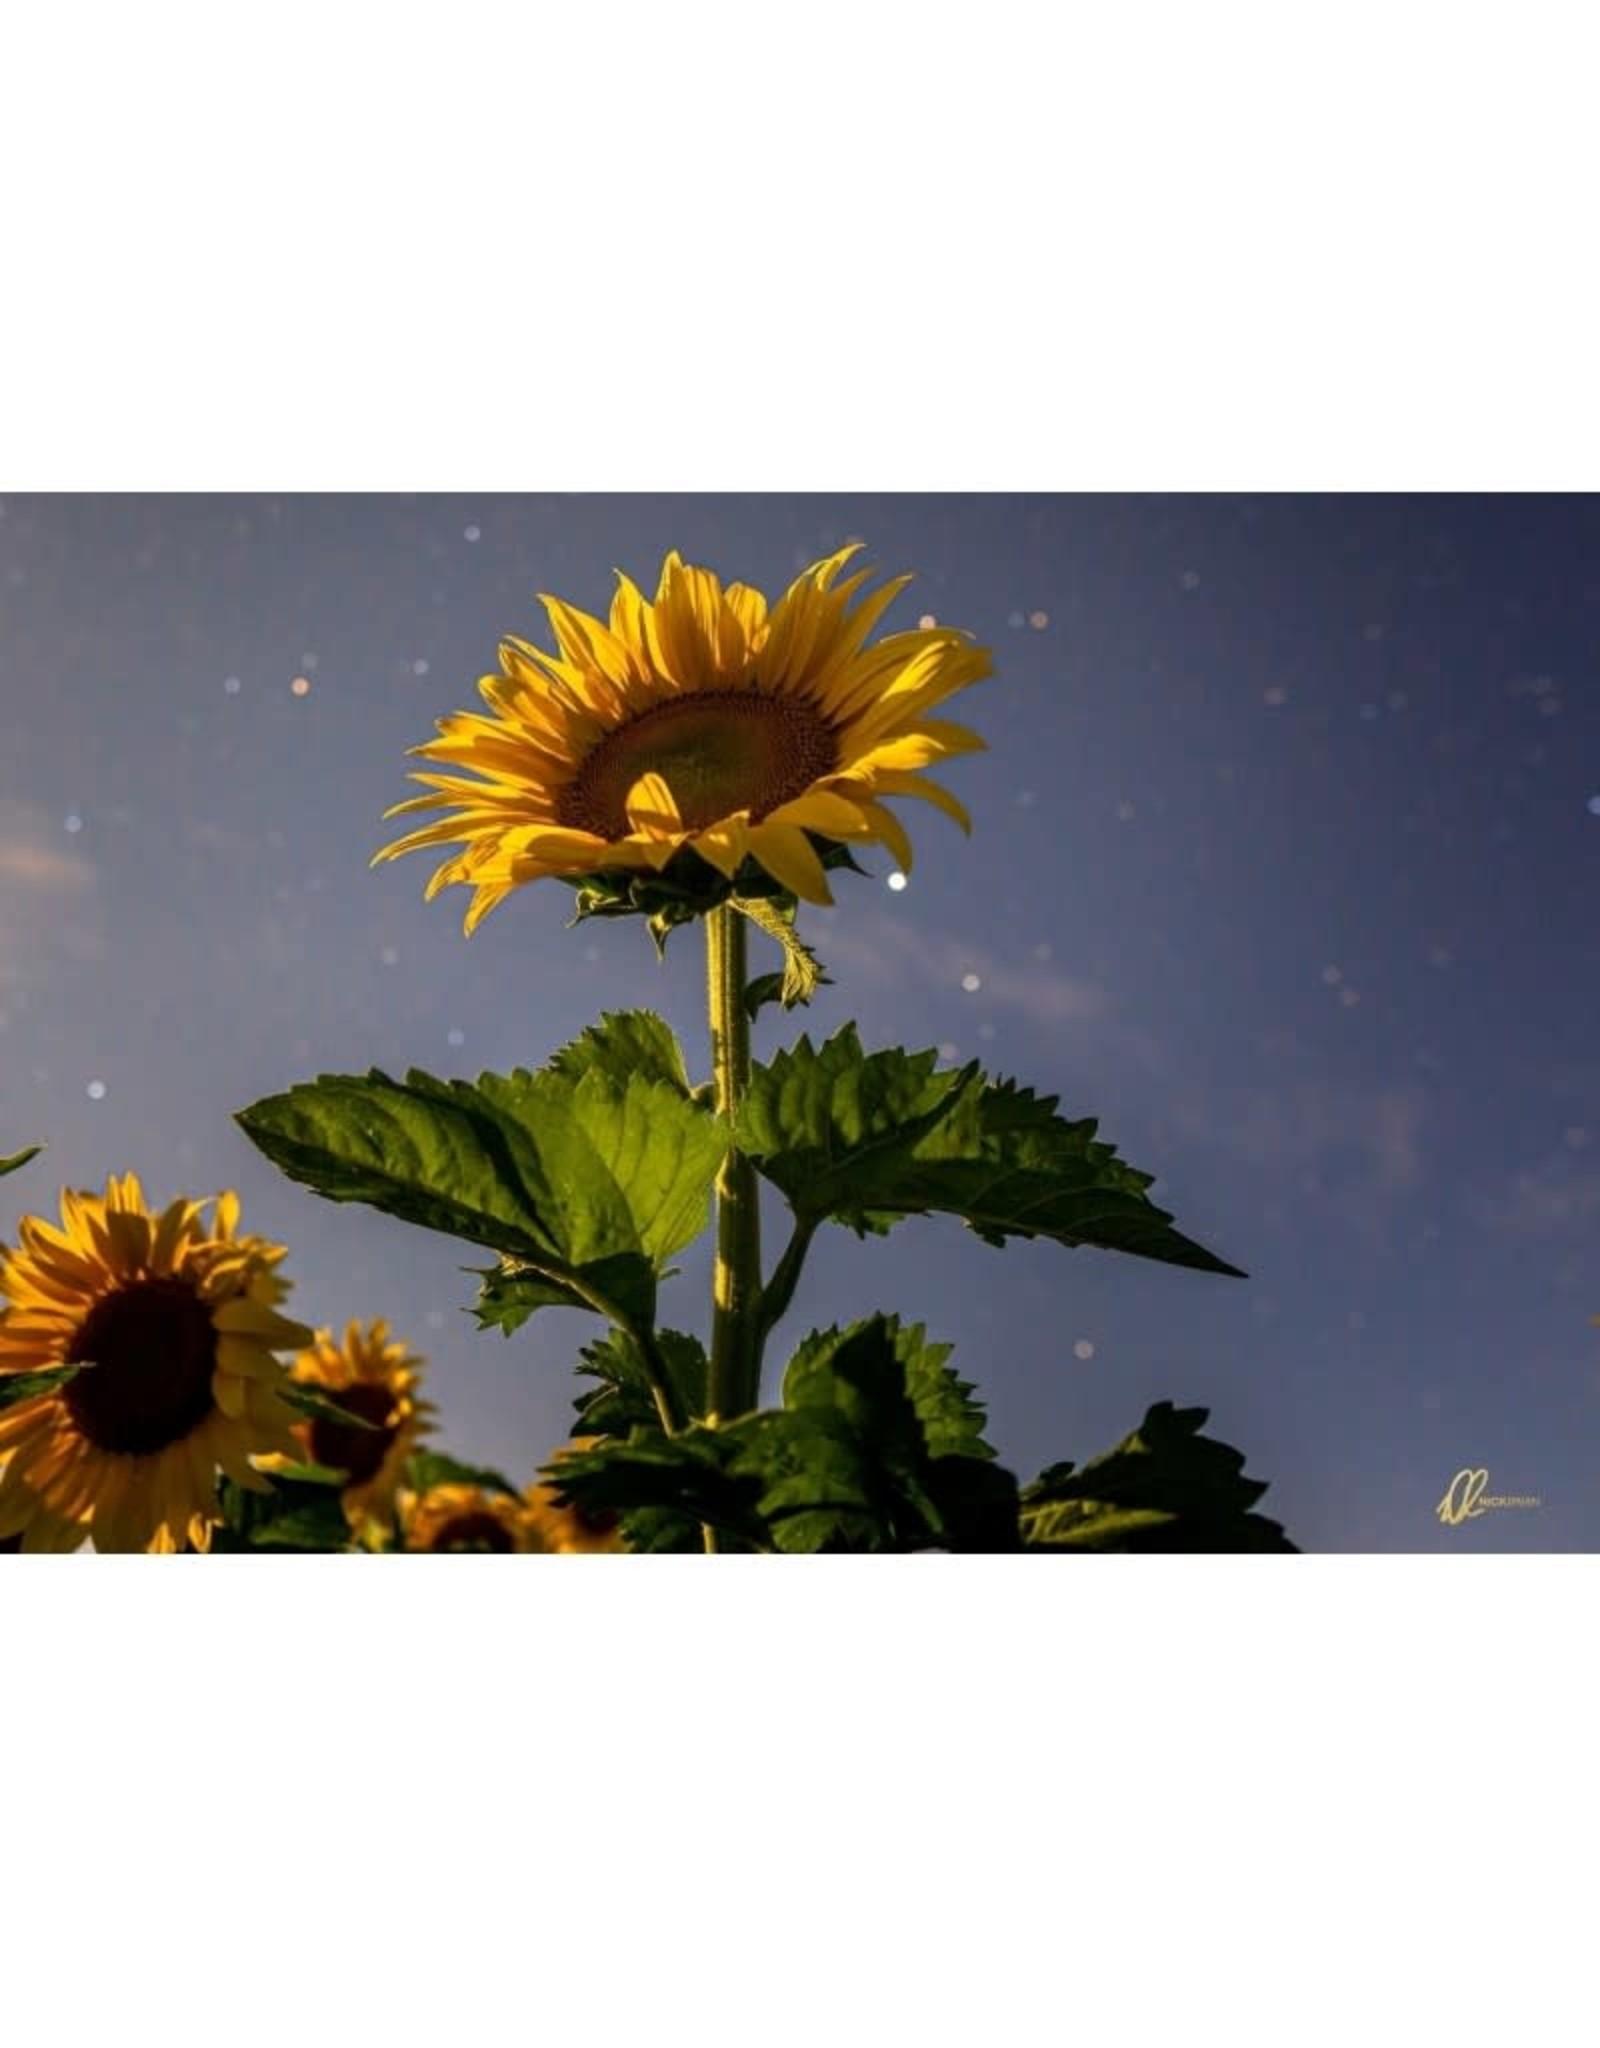 Nick Irwin Images Sunflower in Moonlight